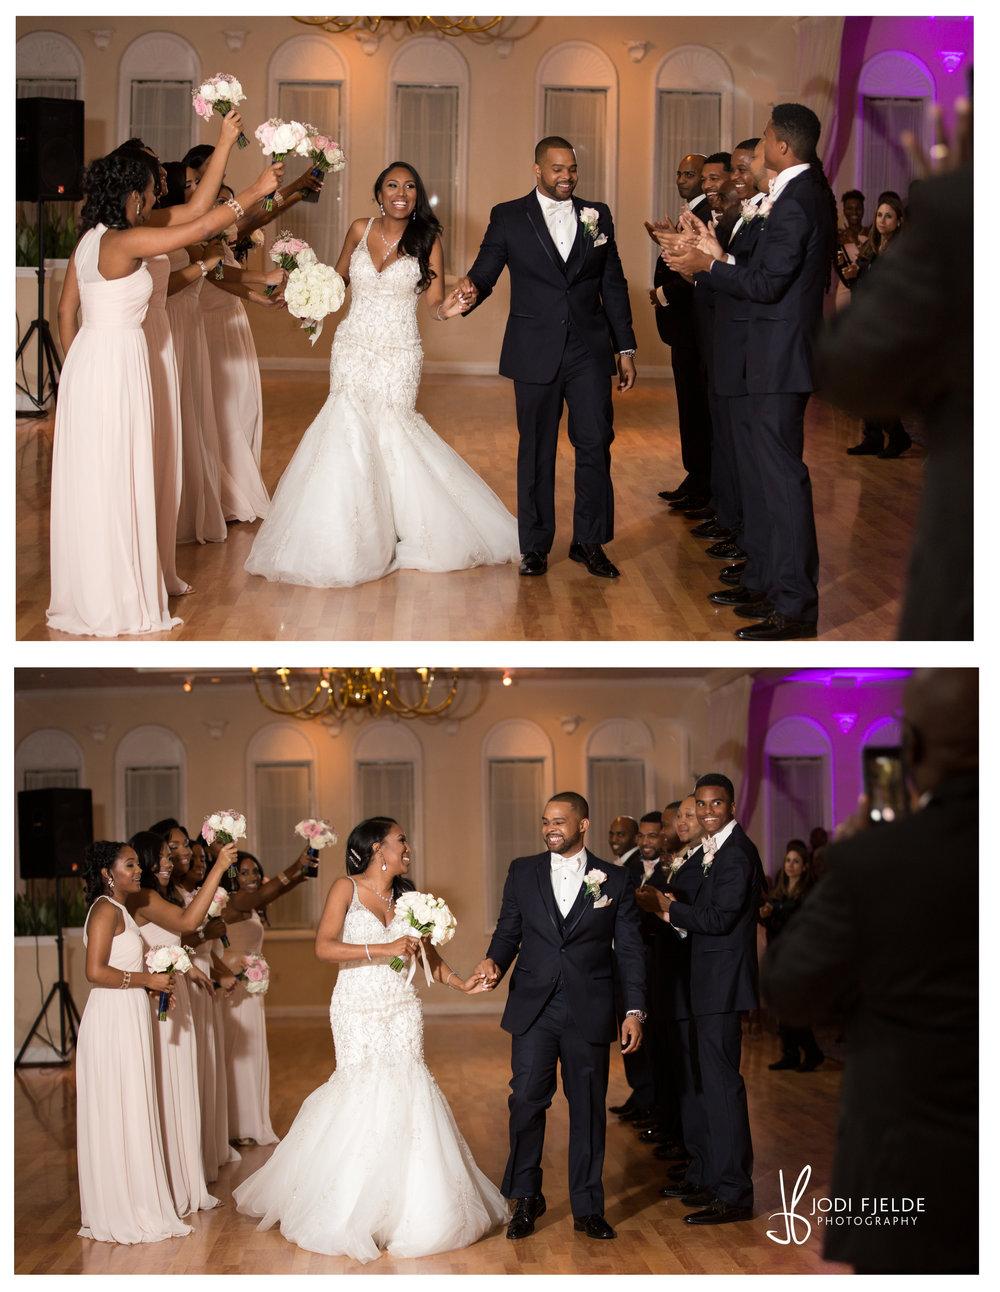 Benvenuto_wedding_Boynton_Beach_Jodi_Fjelde_Photography_Nikki_Otis_married_22.jpg